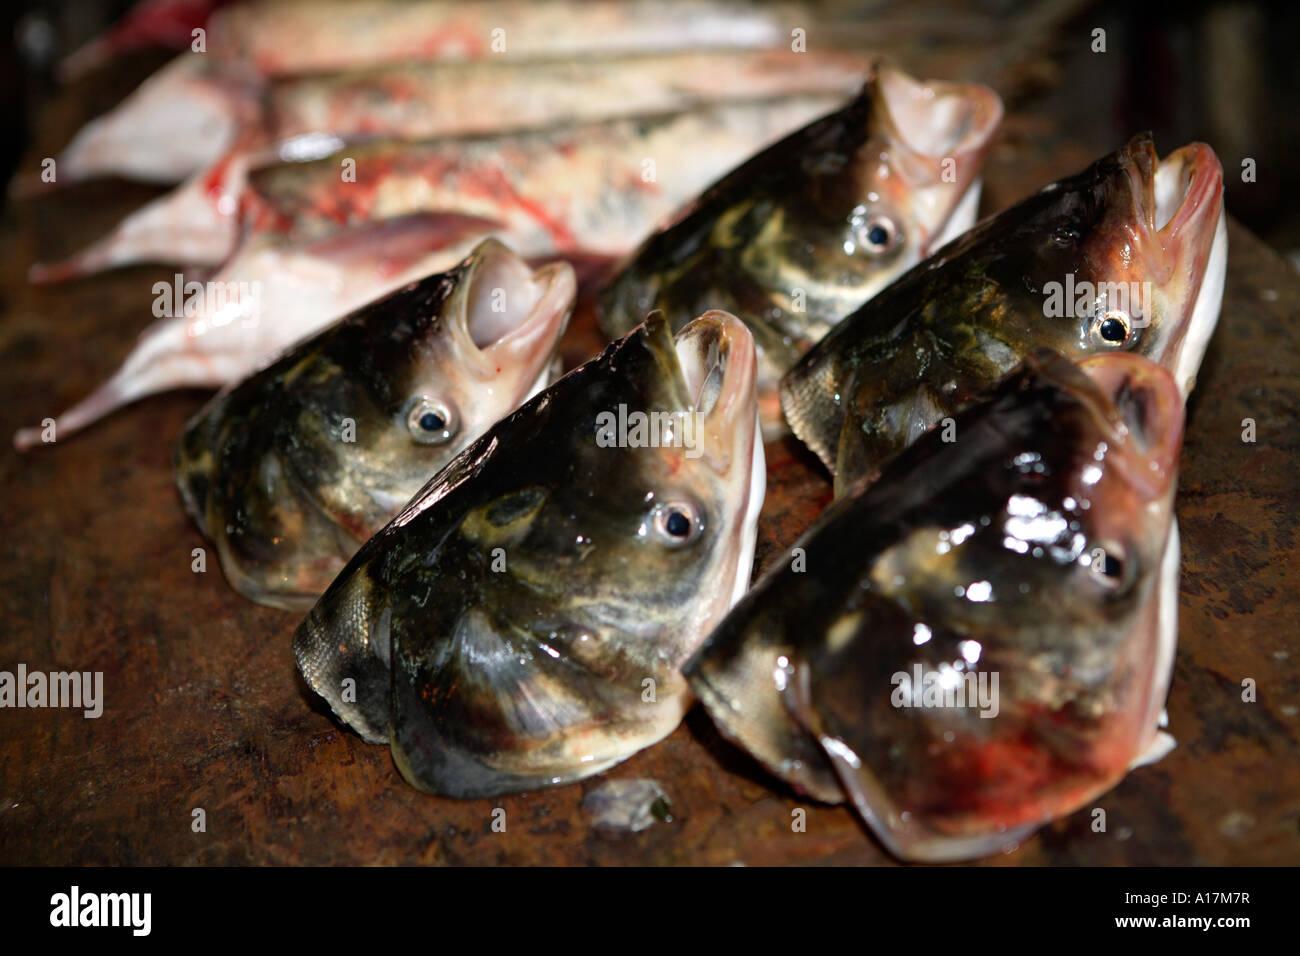 Fish Heads, Central Market, Shunde, Foshan, GuangDong, China. Stock Photo